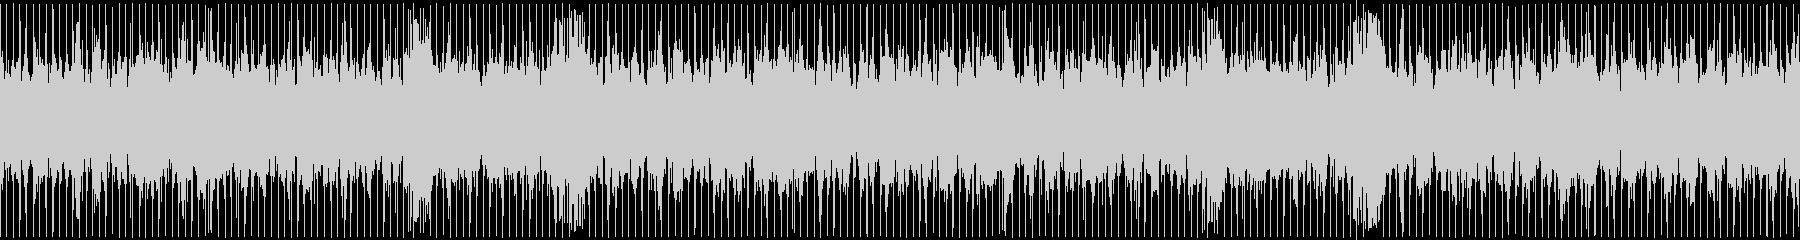 [Playback] old Funk loop's unreproduced waveform